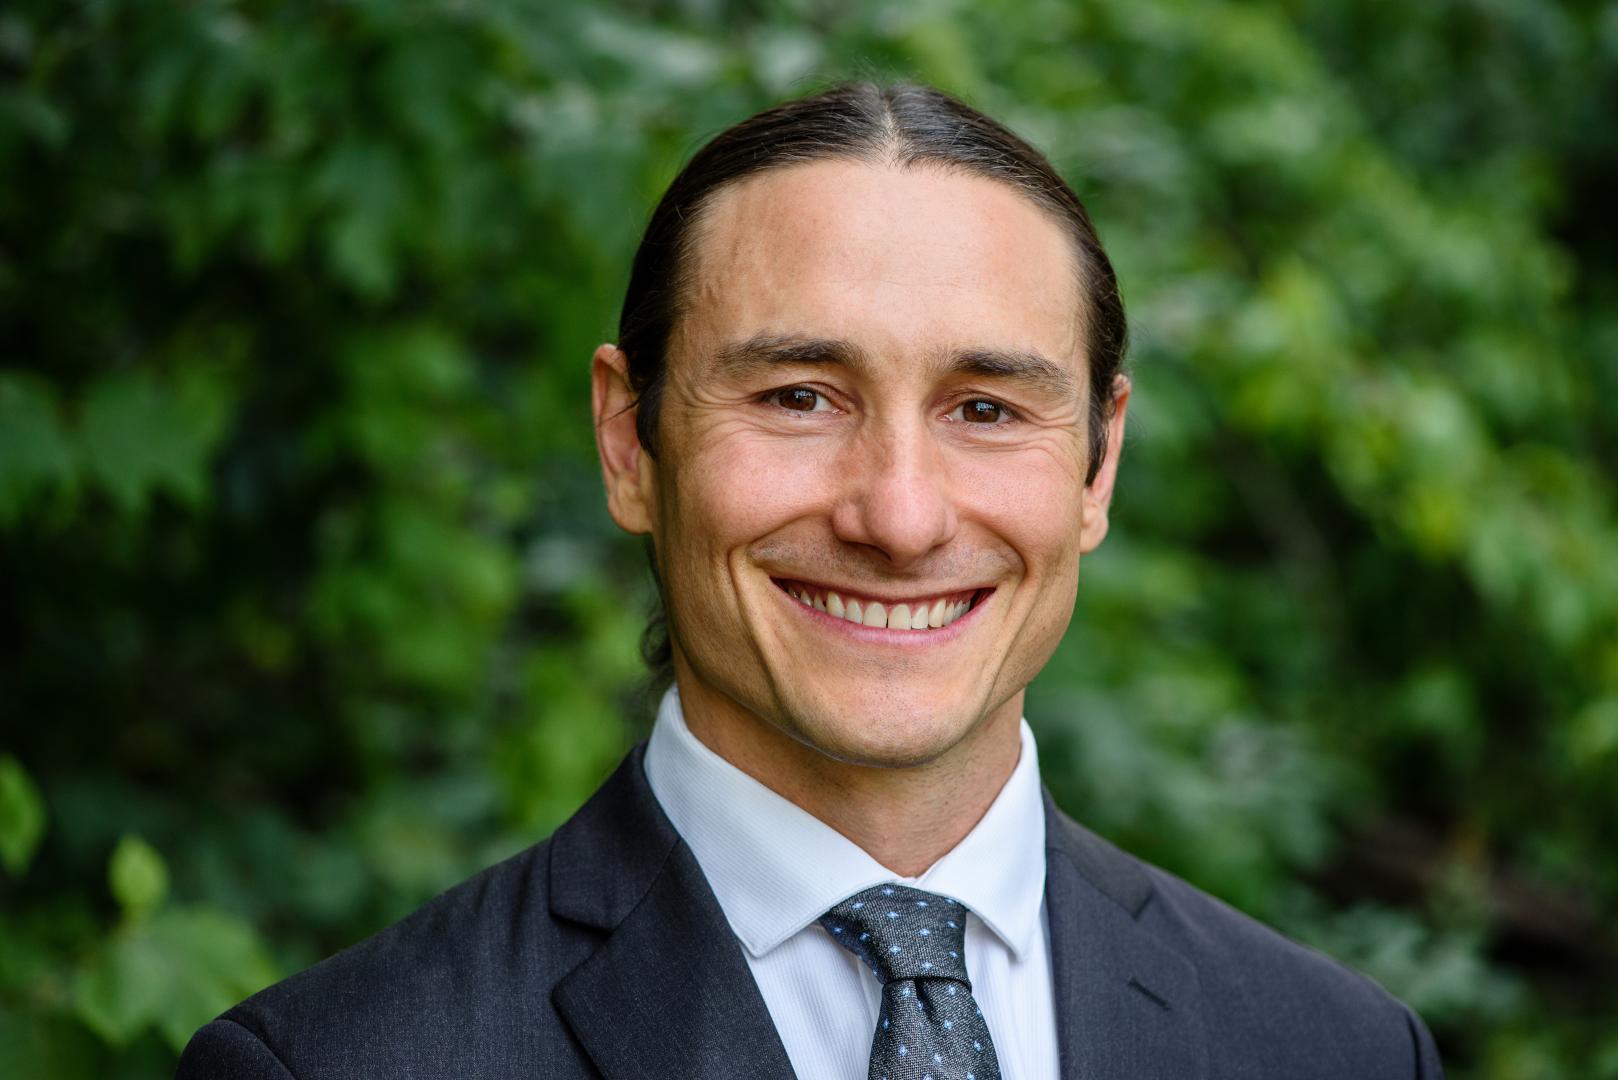 Dr. Dustin Sulak, D.O.